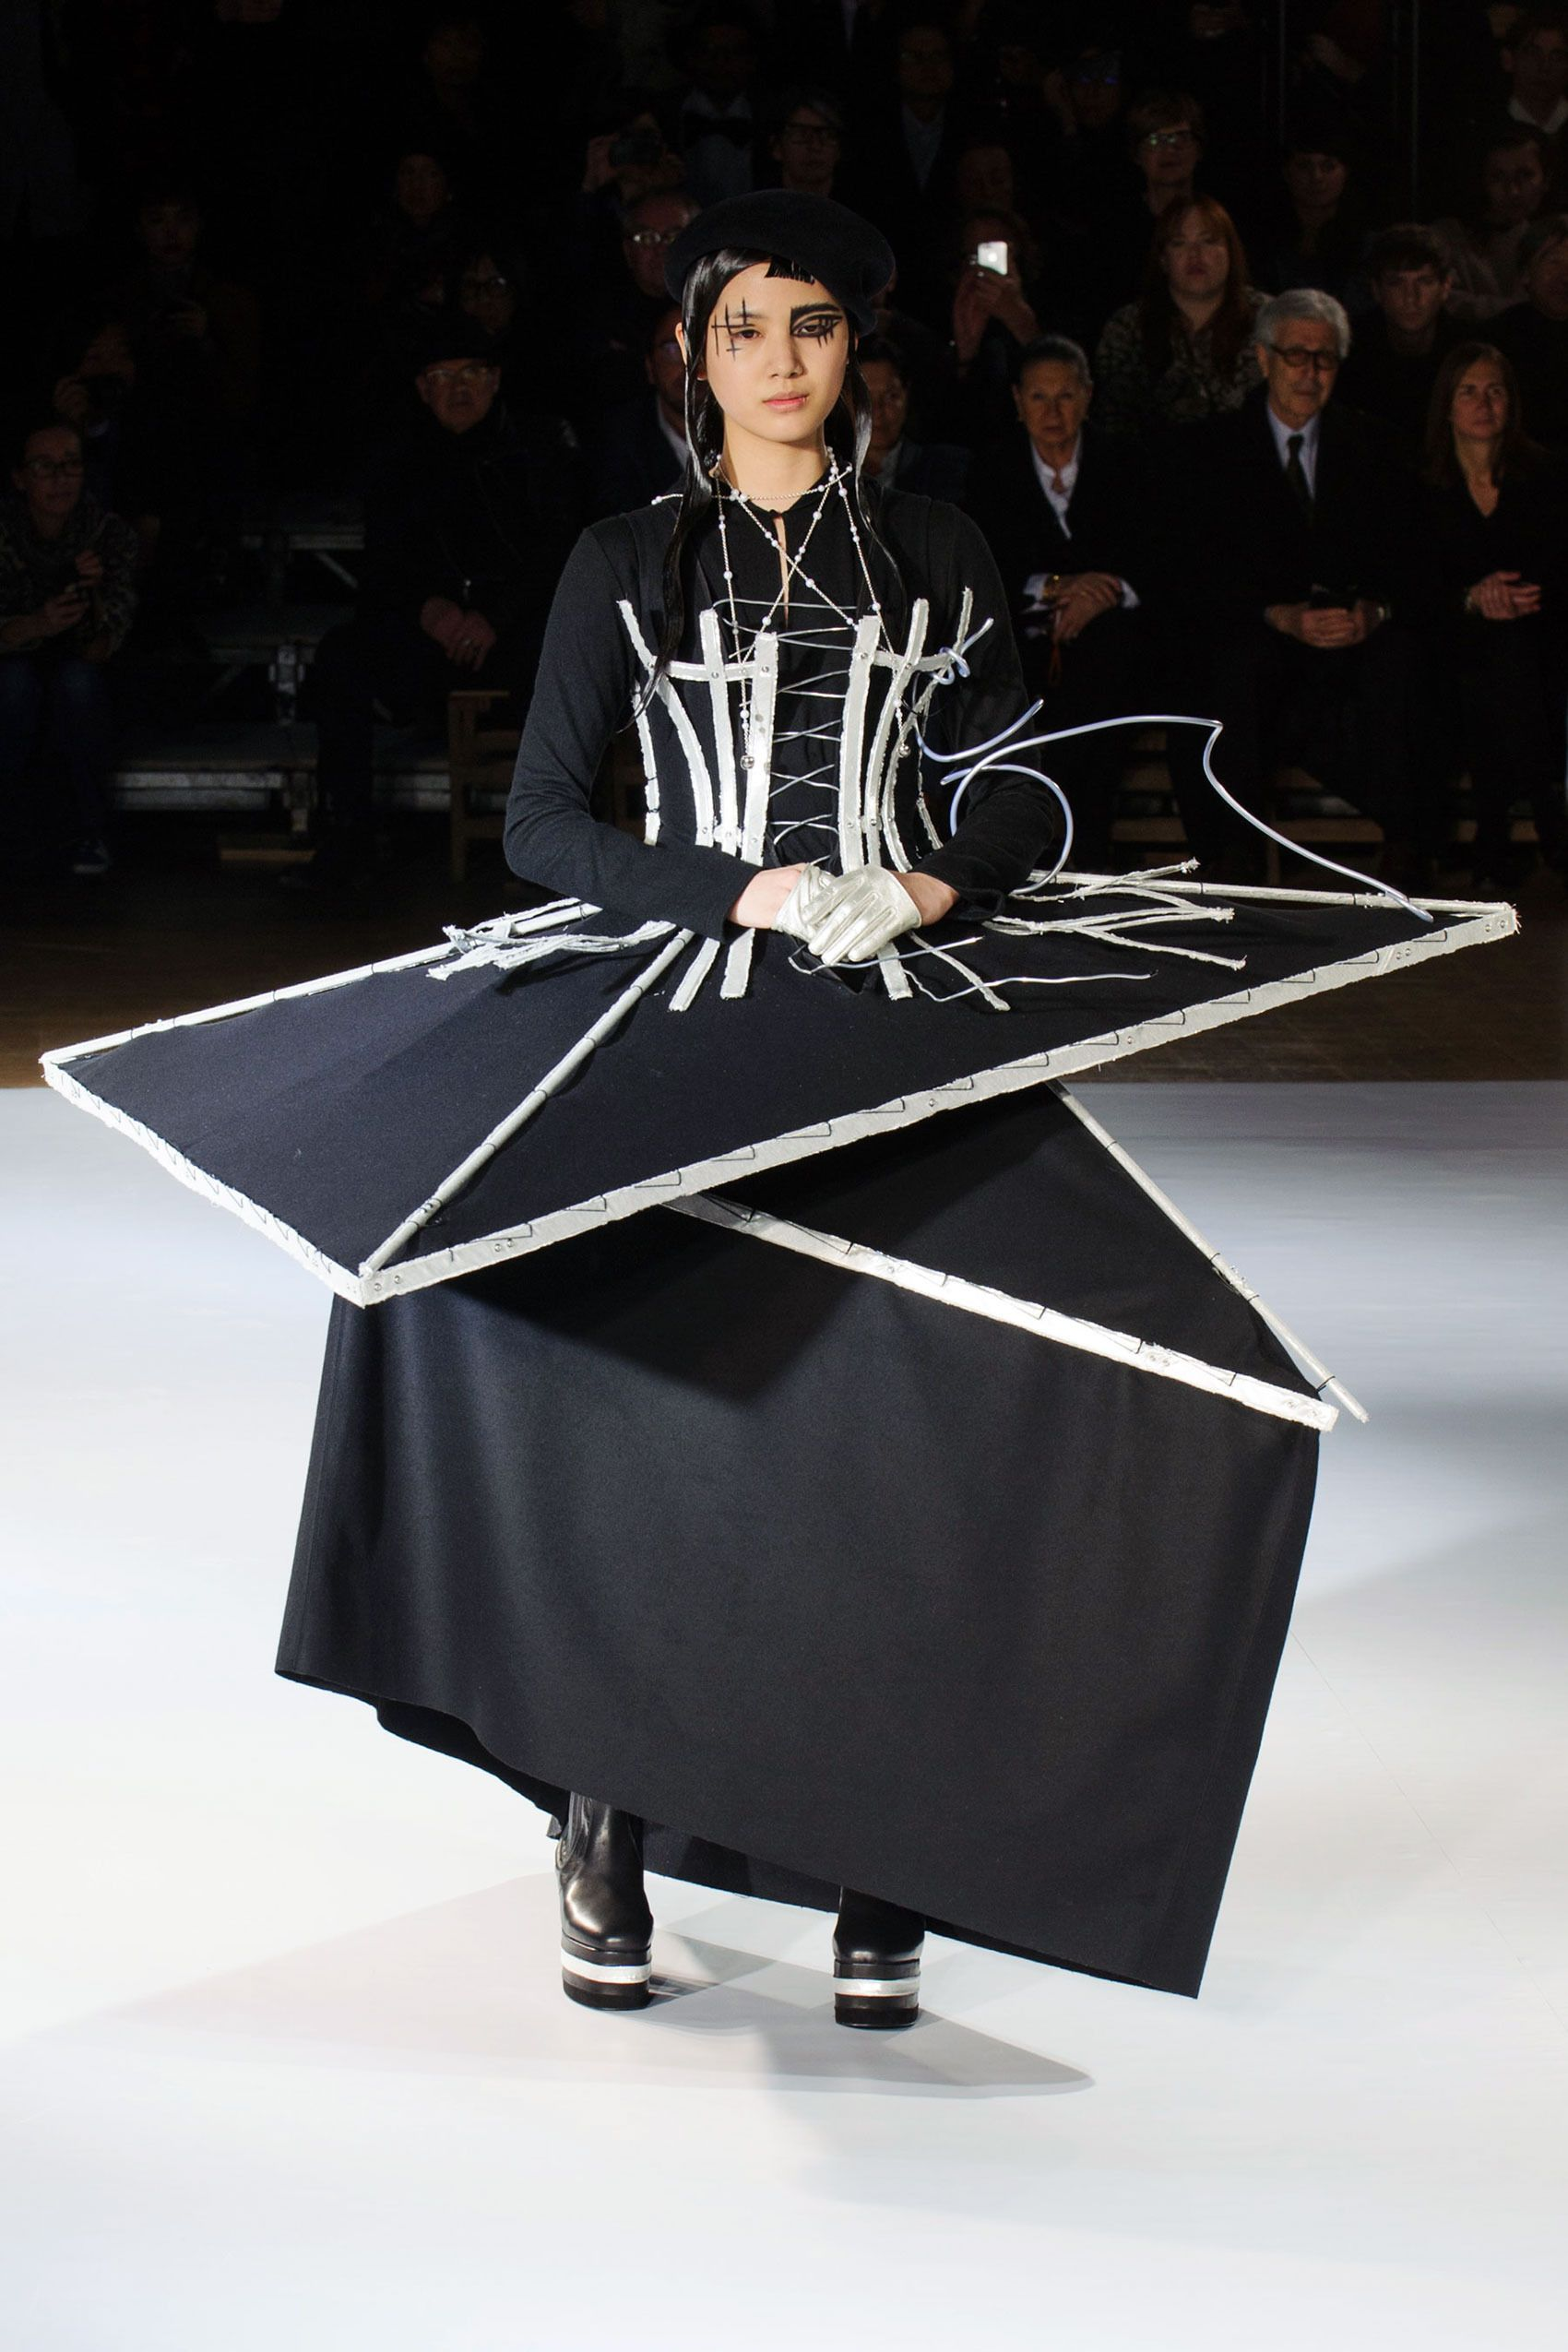 27559bf7275 Conceptual Fashion - dress inspired by buildings under construction   sculptural fashion    Yohji Yamamoto Fall 2015